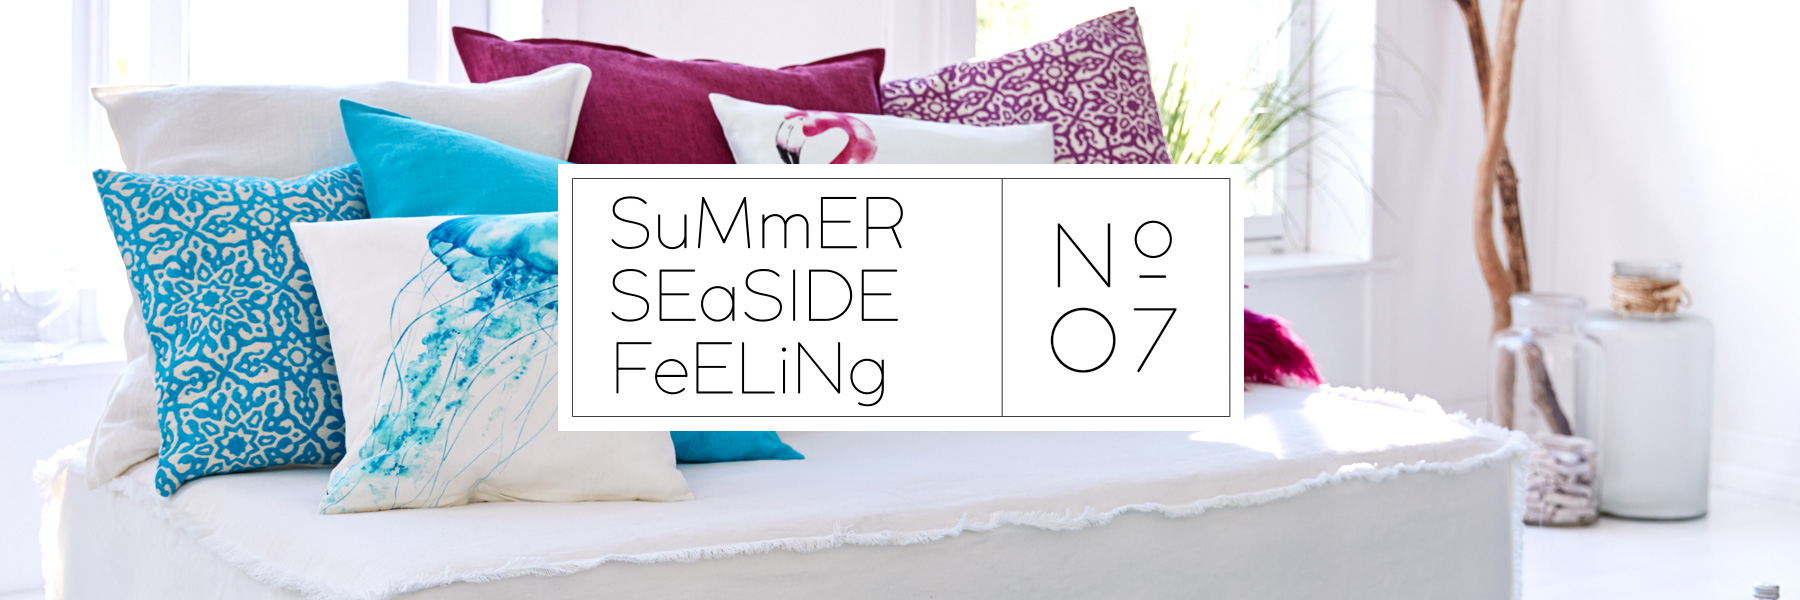 Summer Seaside Feeling